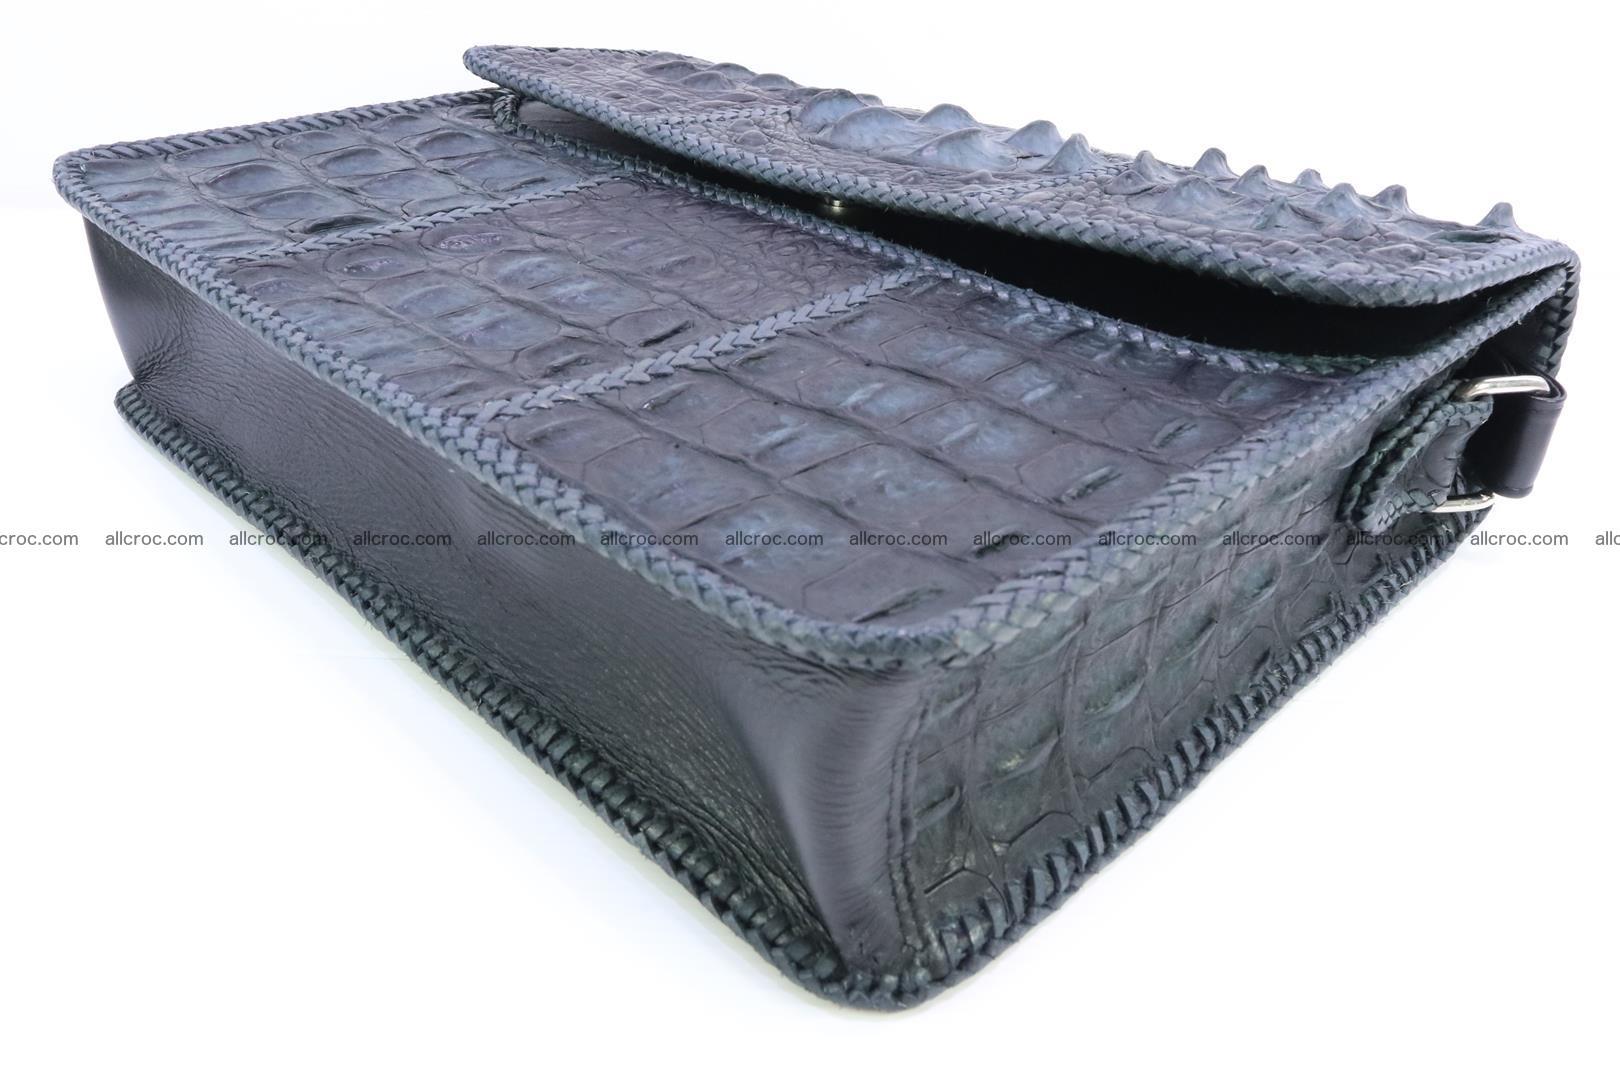 Crocodile skin shoulder bag with braided edges 146 Foto 8